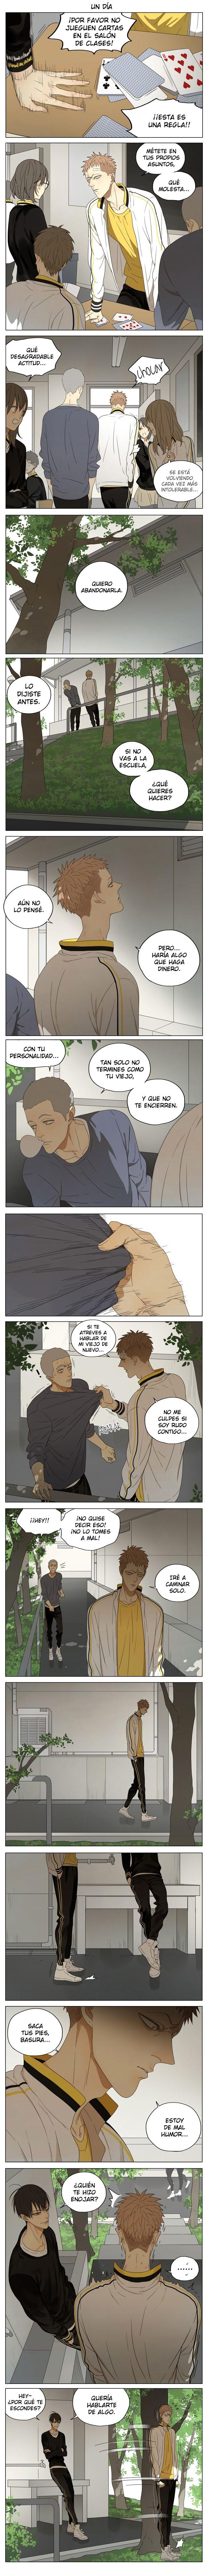 http://c5.ninemanga.com/es_manga/7/15943/454421/0891f5ce1c97f4207820d208852e4133.jpg Page 2